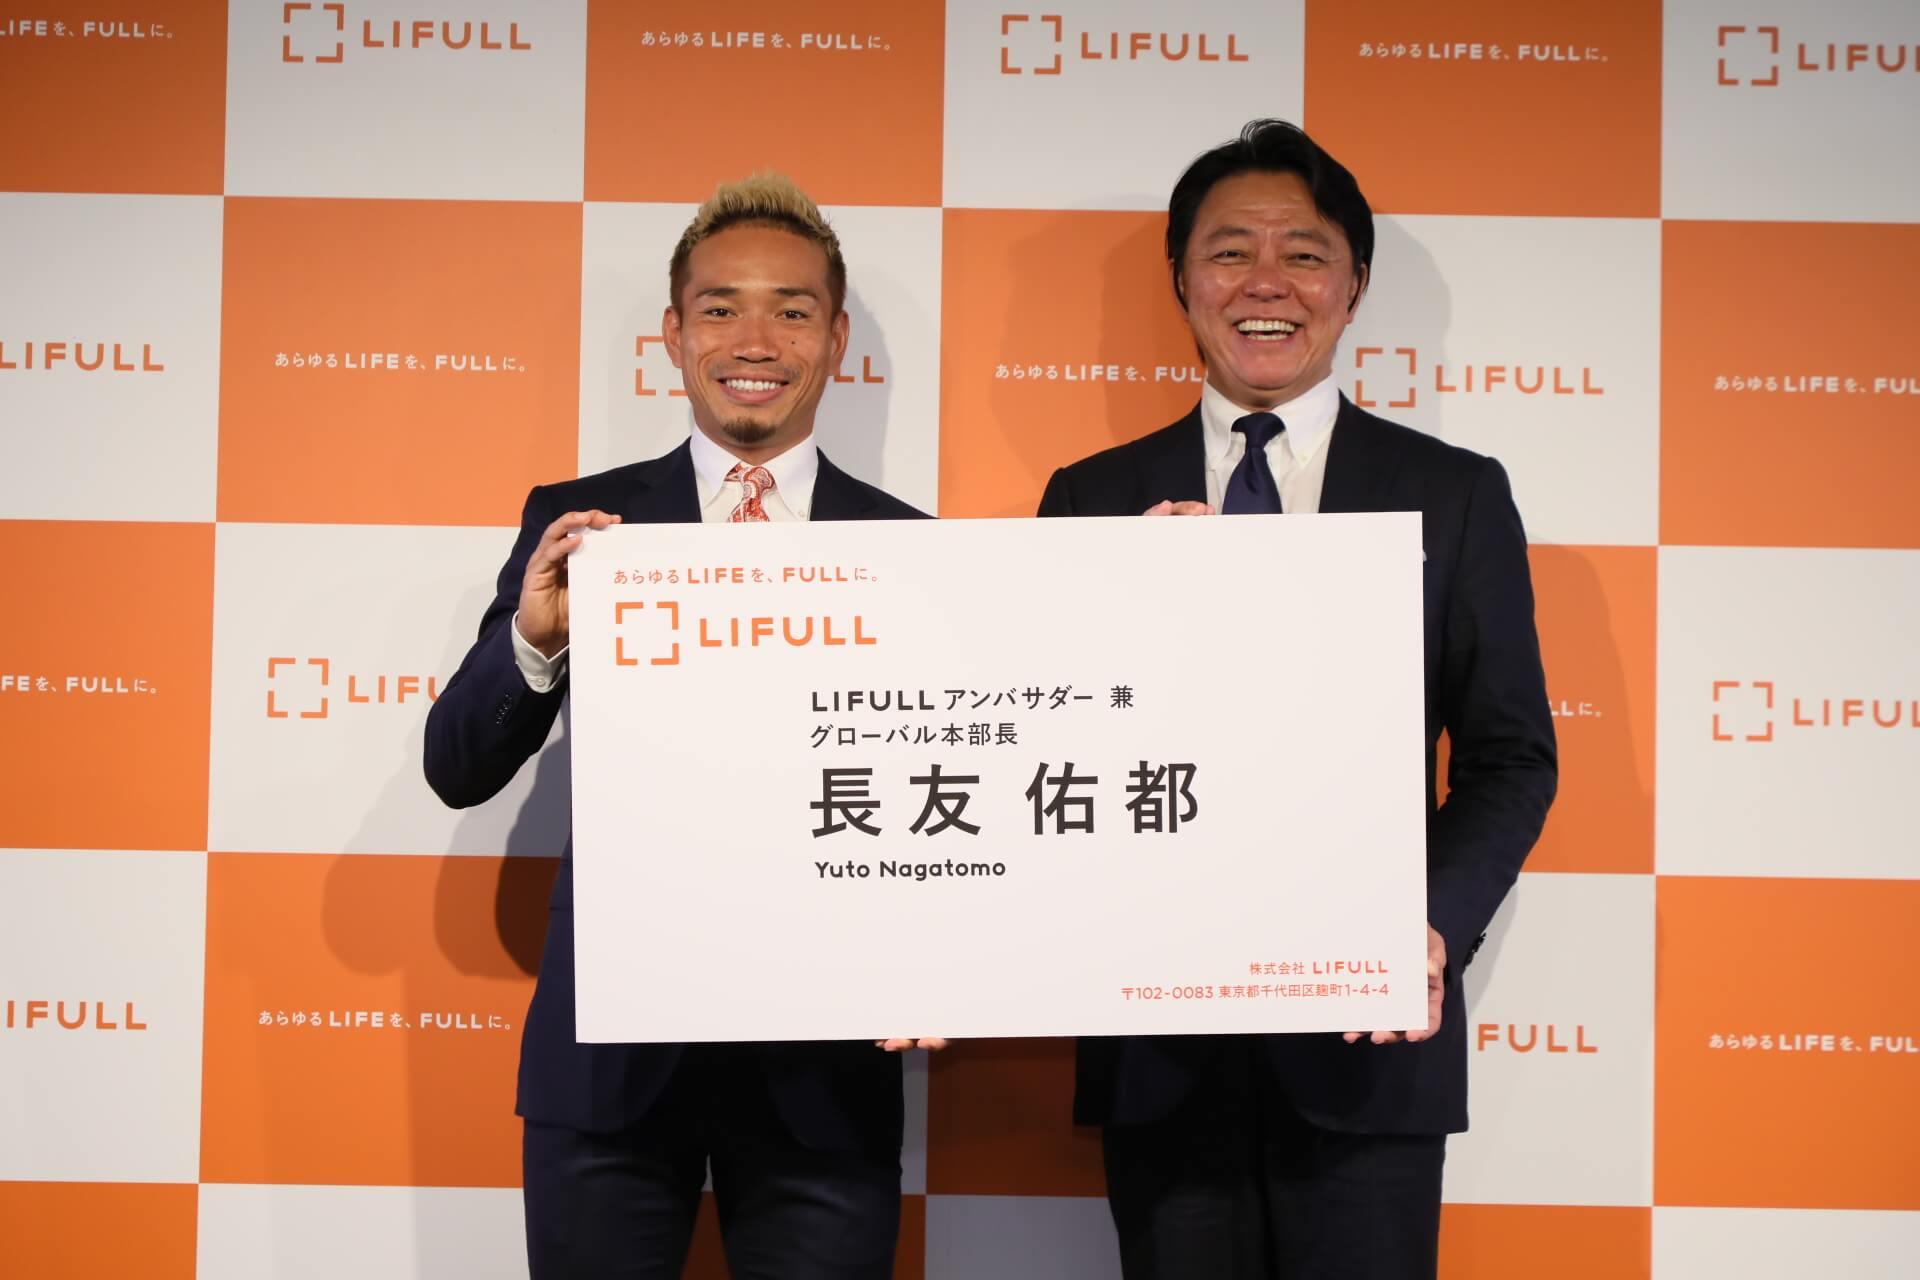 Yuuko Nagatomo (left) receives a commemorative card from Lifull CEO Takashi Inoue